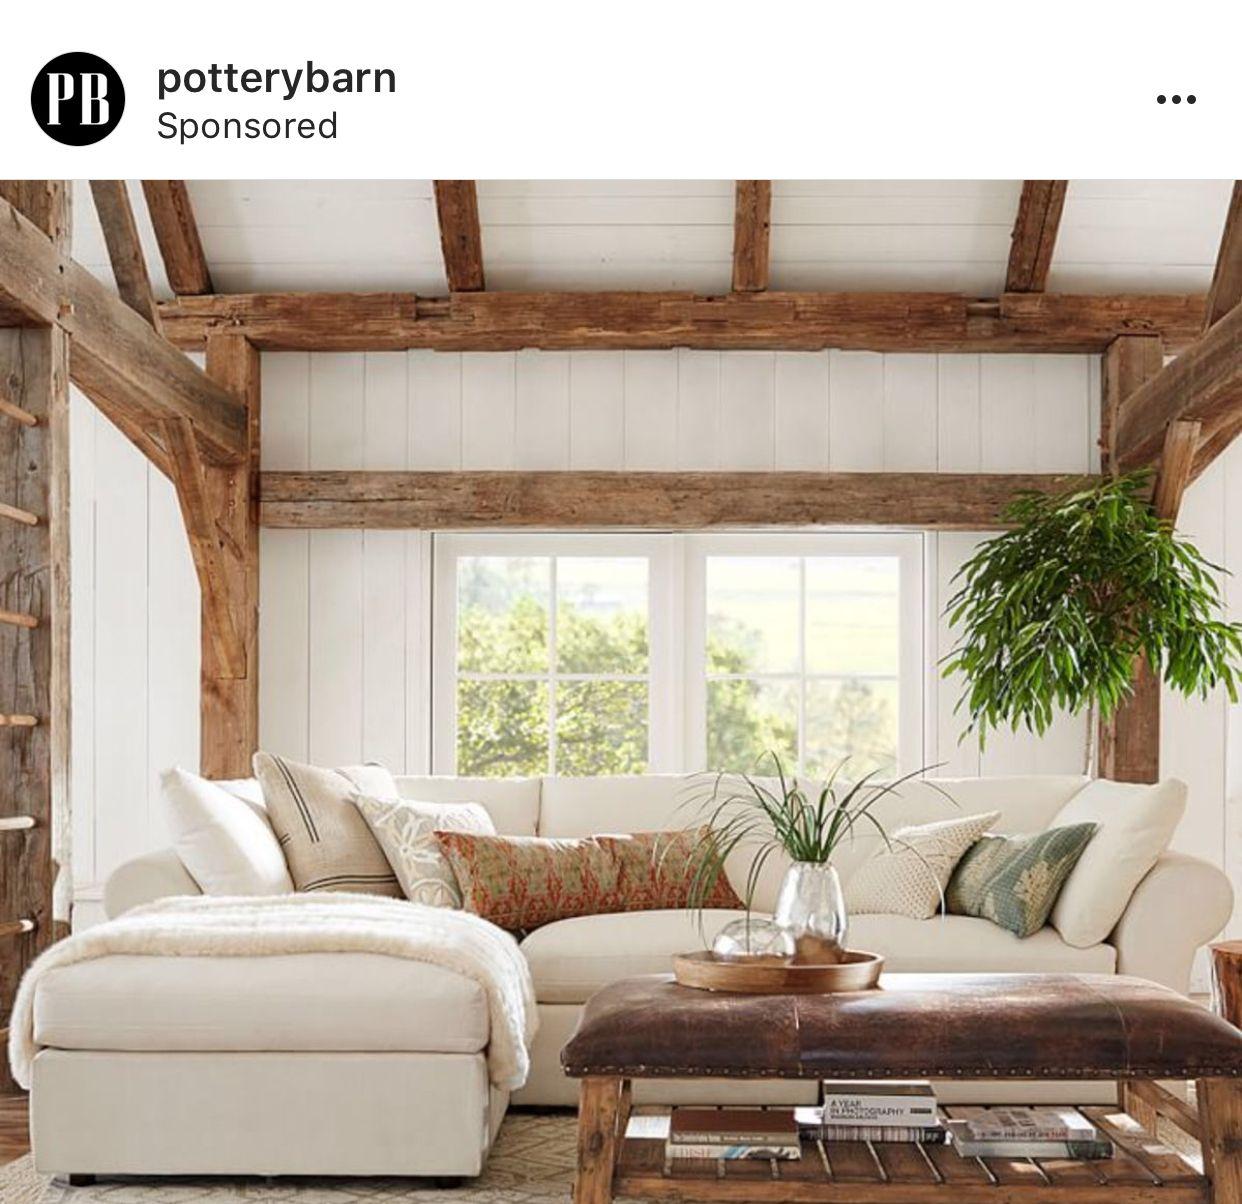 23 Charming Beige Living Room Design Ideas To Brighten Up: 집 꾸미기, 인테리어, 집